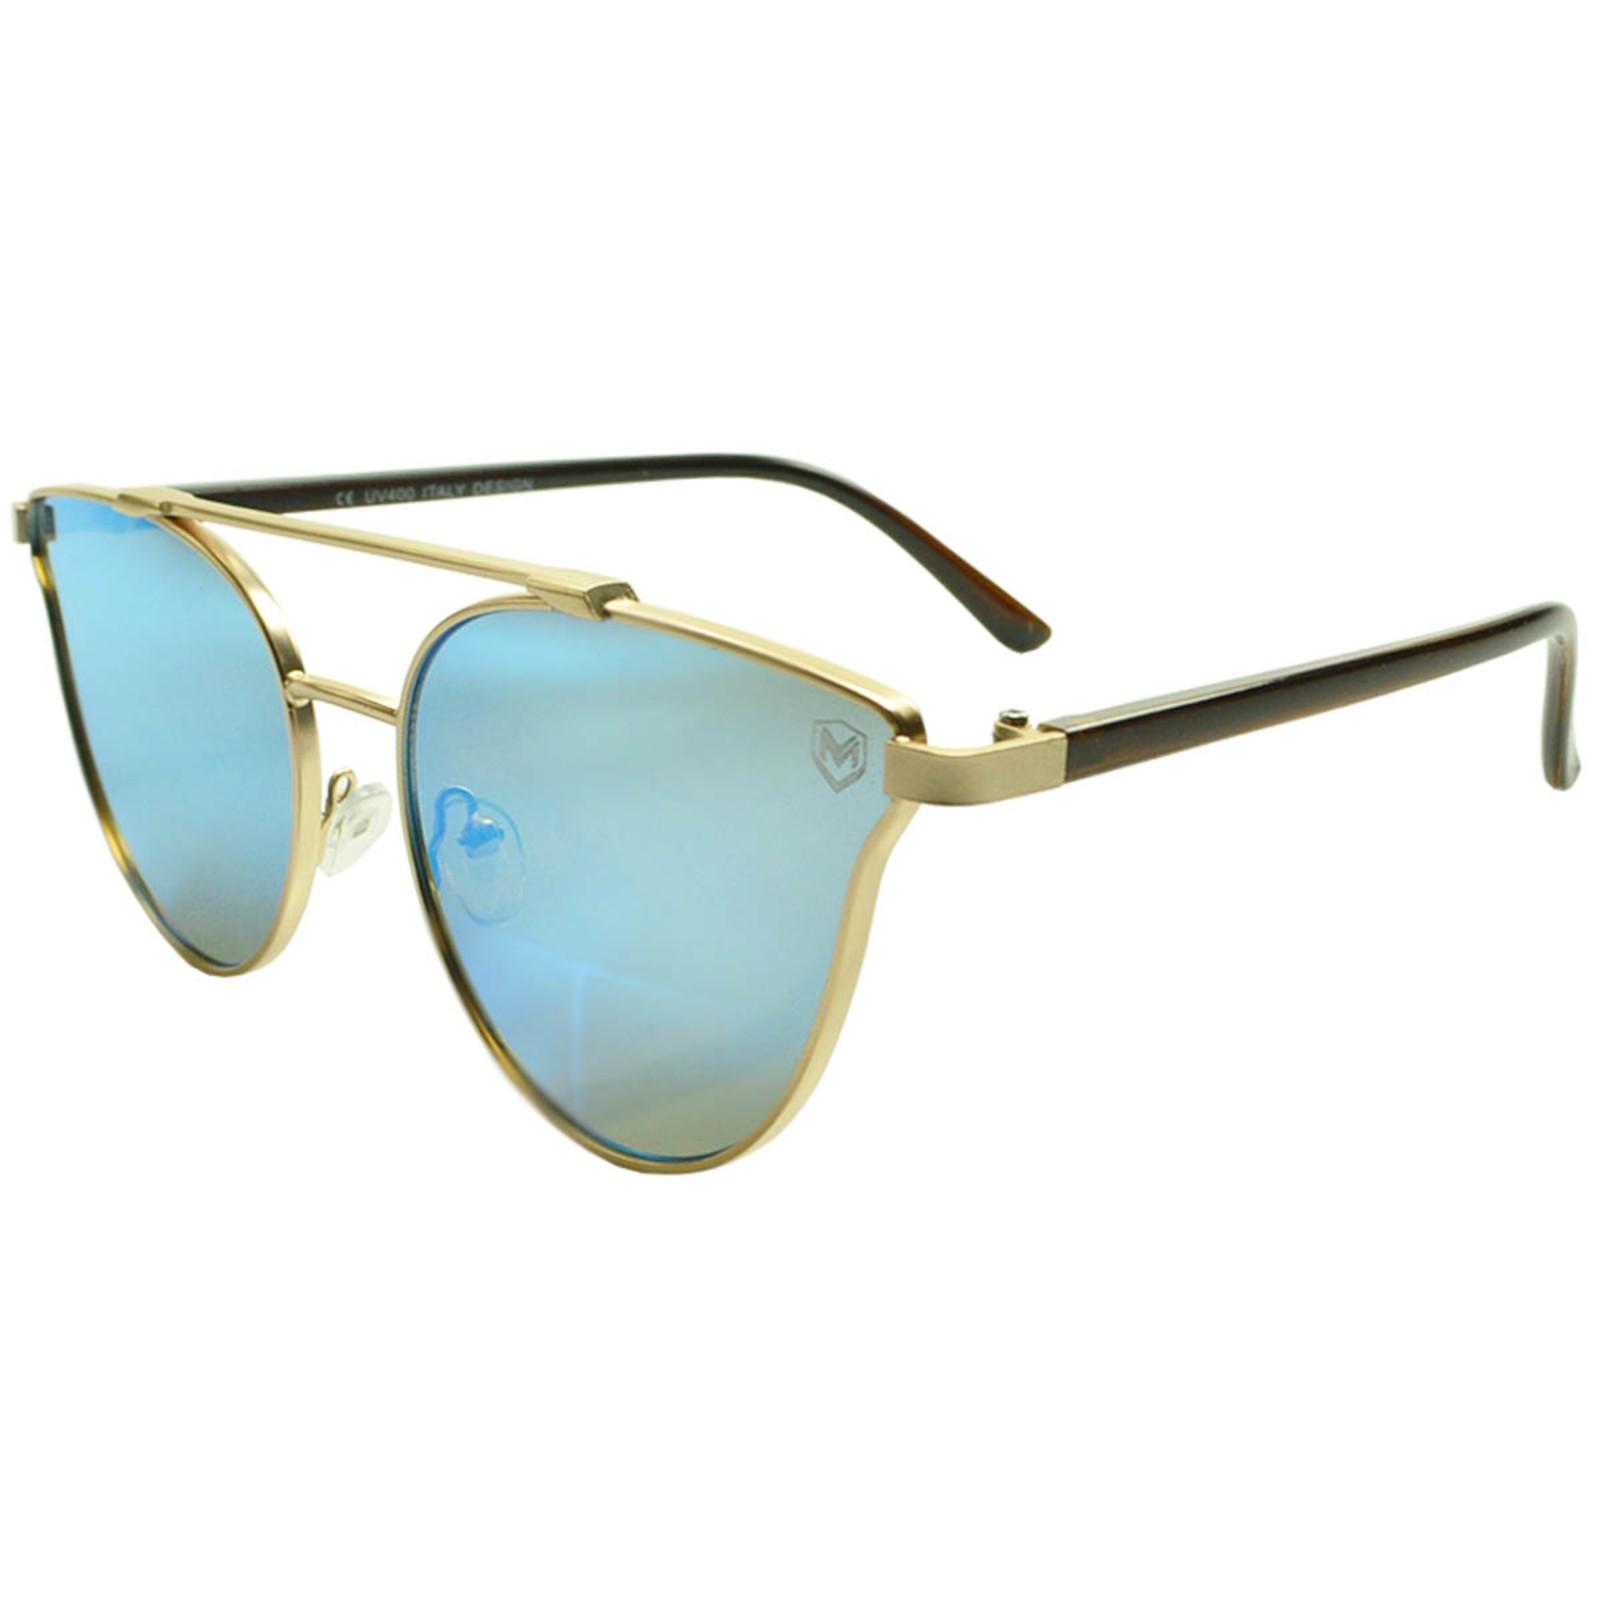 Óculos de Sol Mackage Metal/Acetato Feminino Gateado - Dourado/Azul